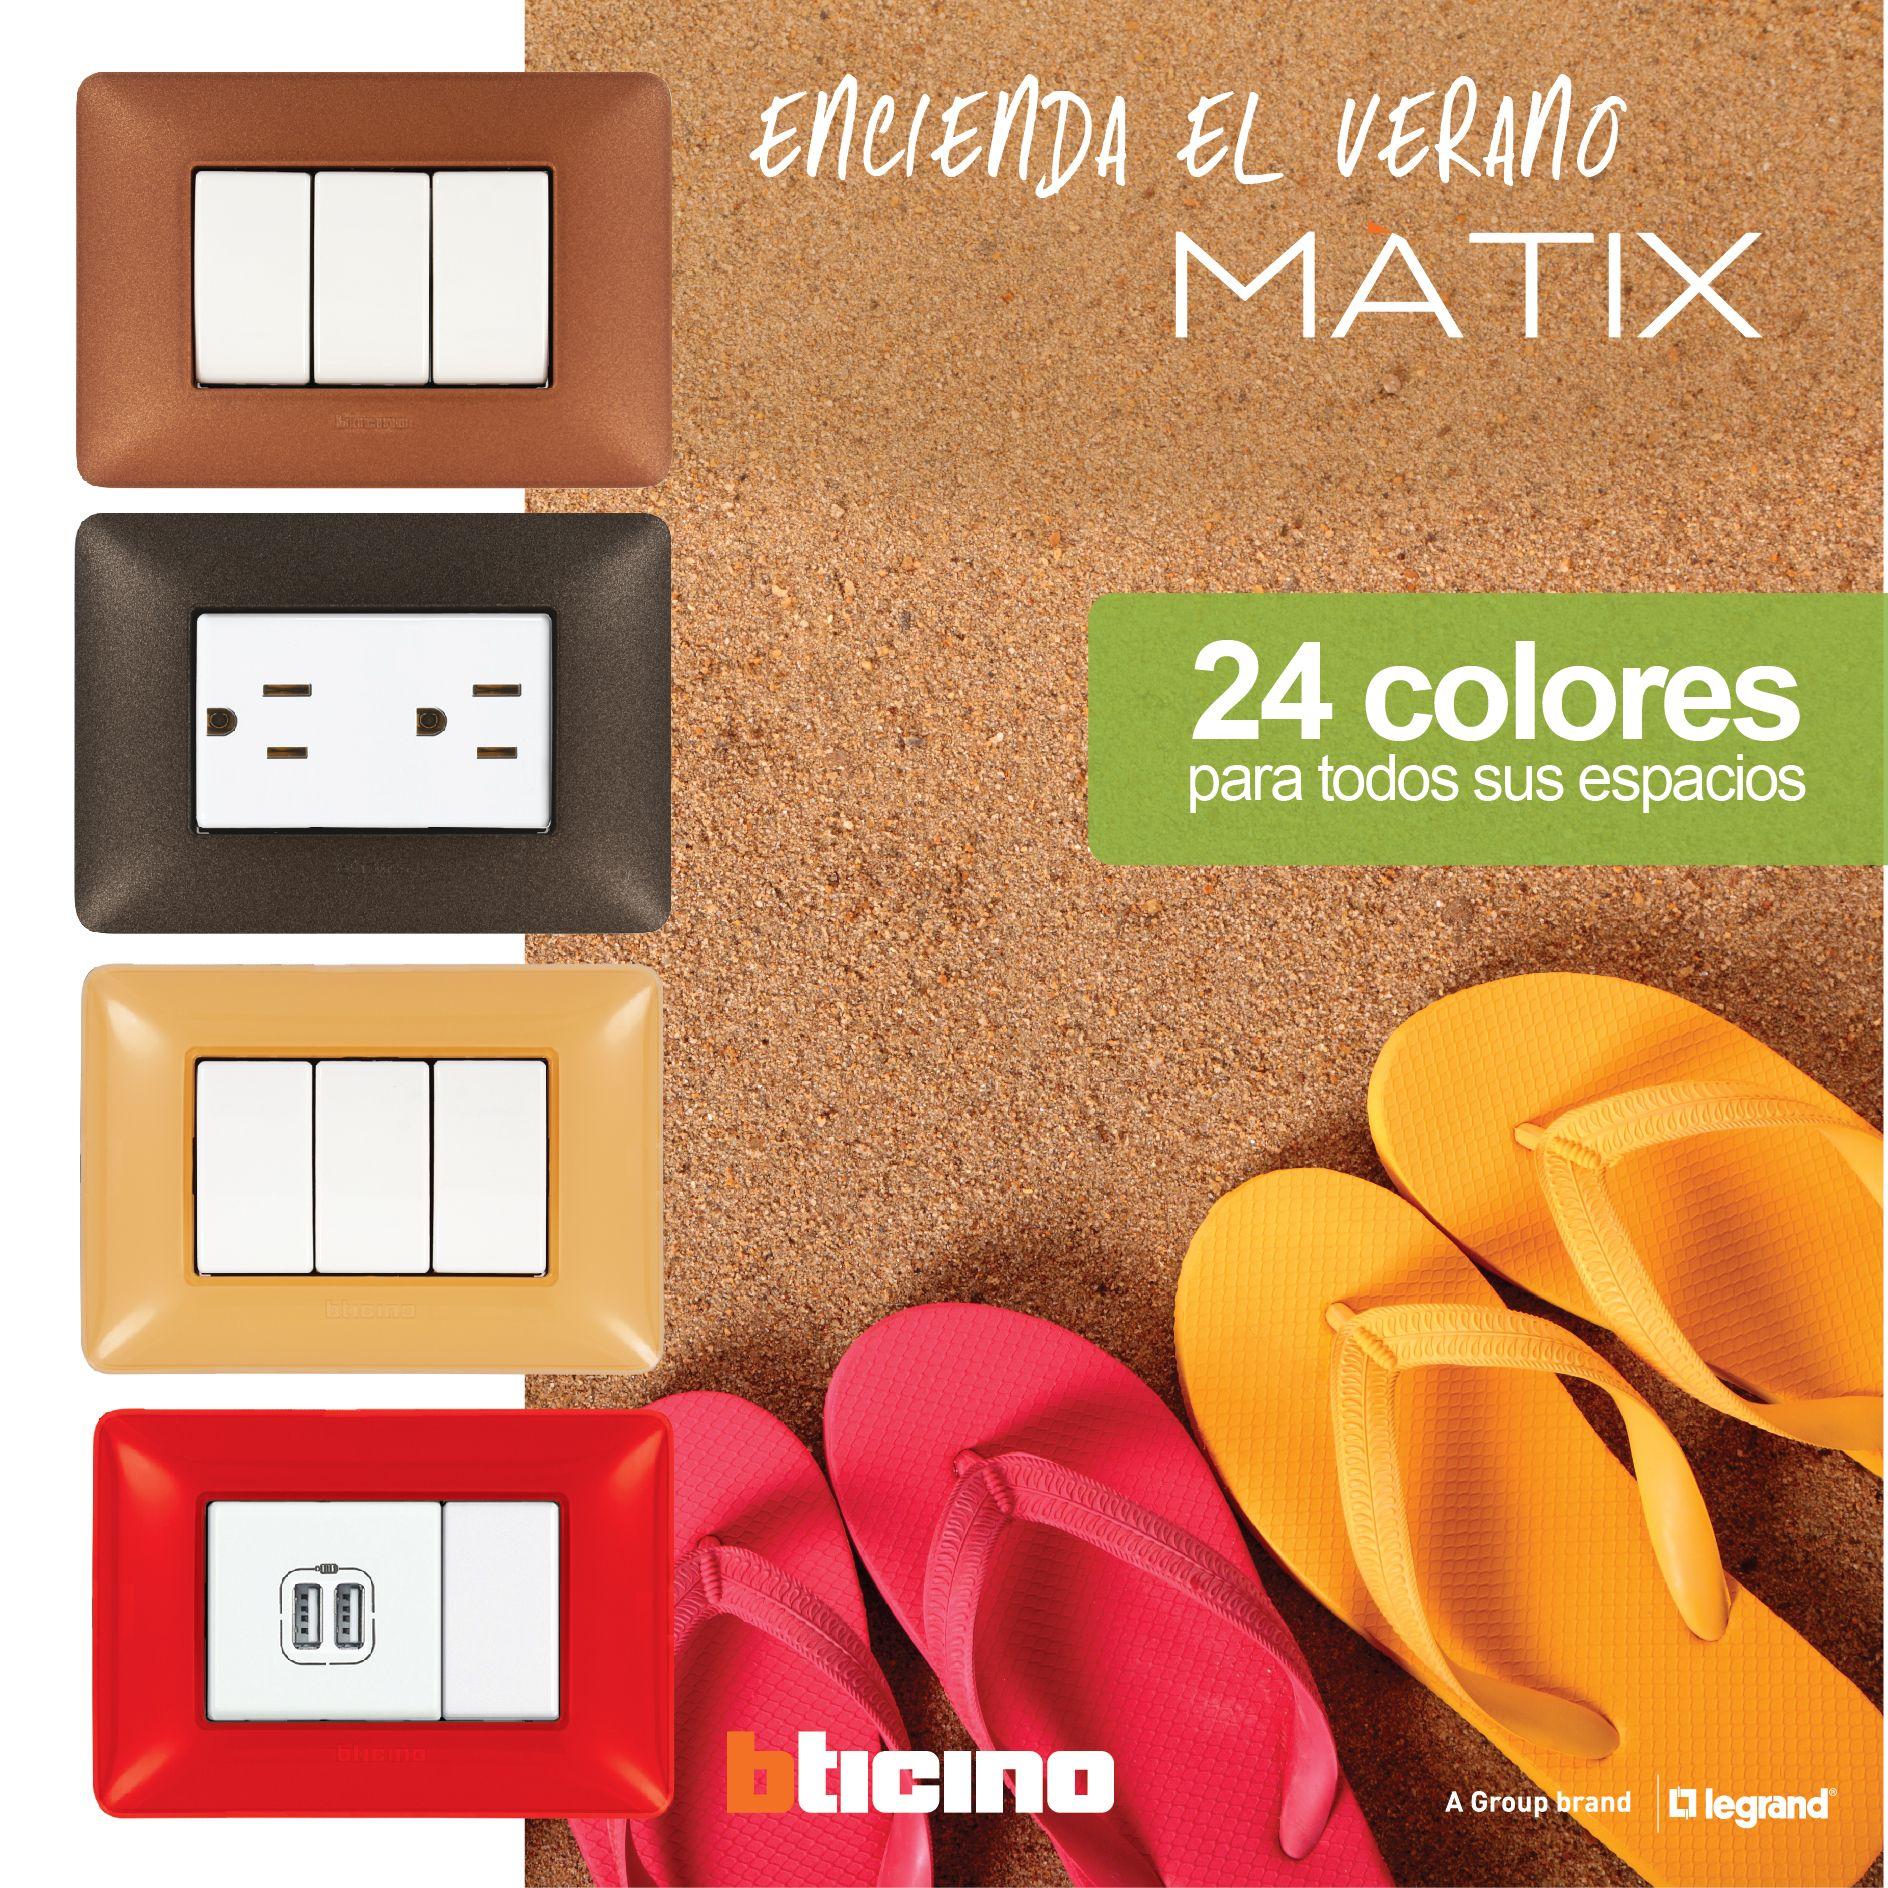 ¡Refresque su hogar u oficina este verano con 24 colores de #Matix! http://goo.gl/CwQC2t